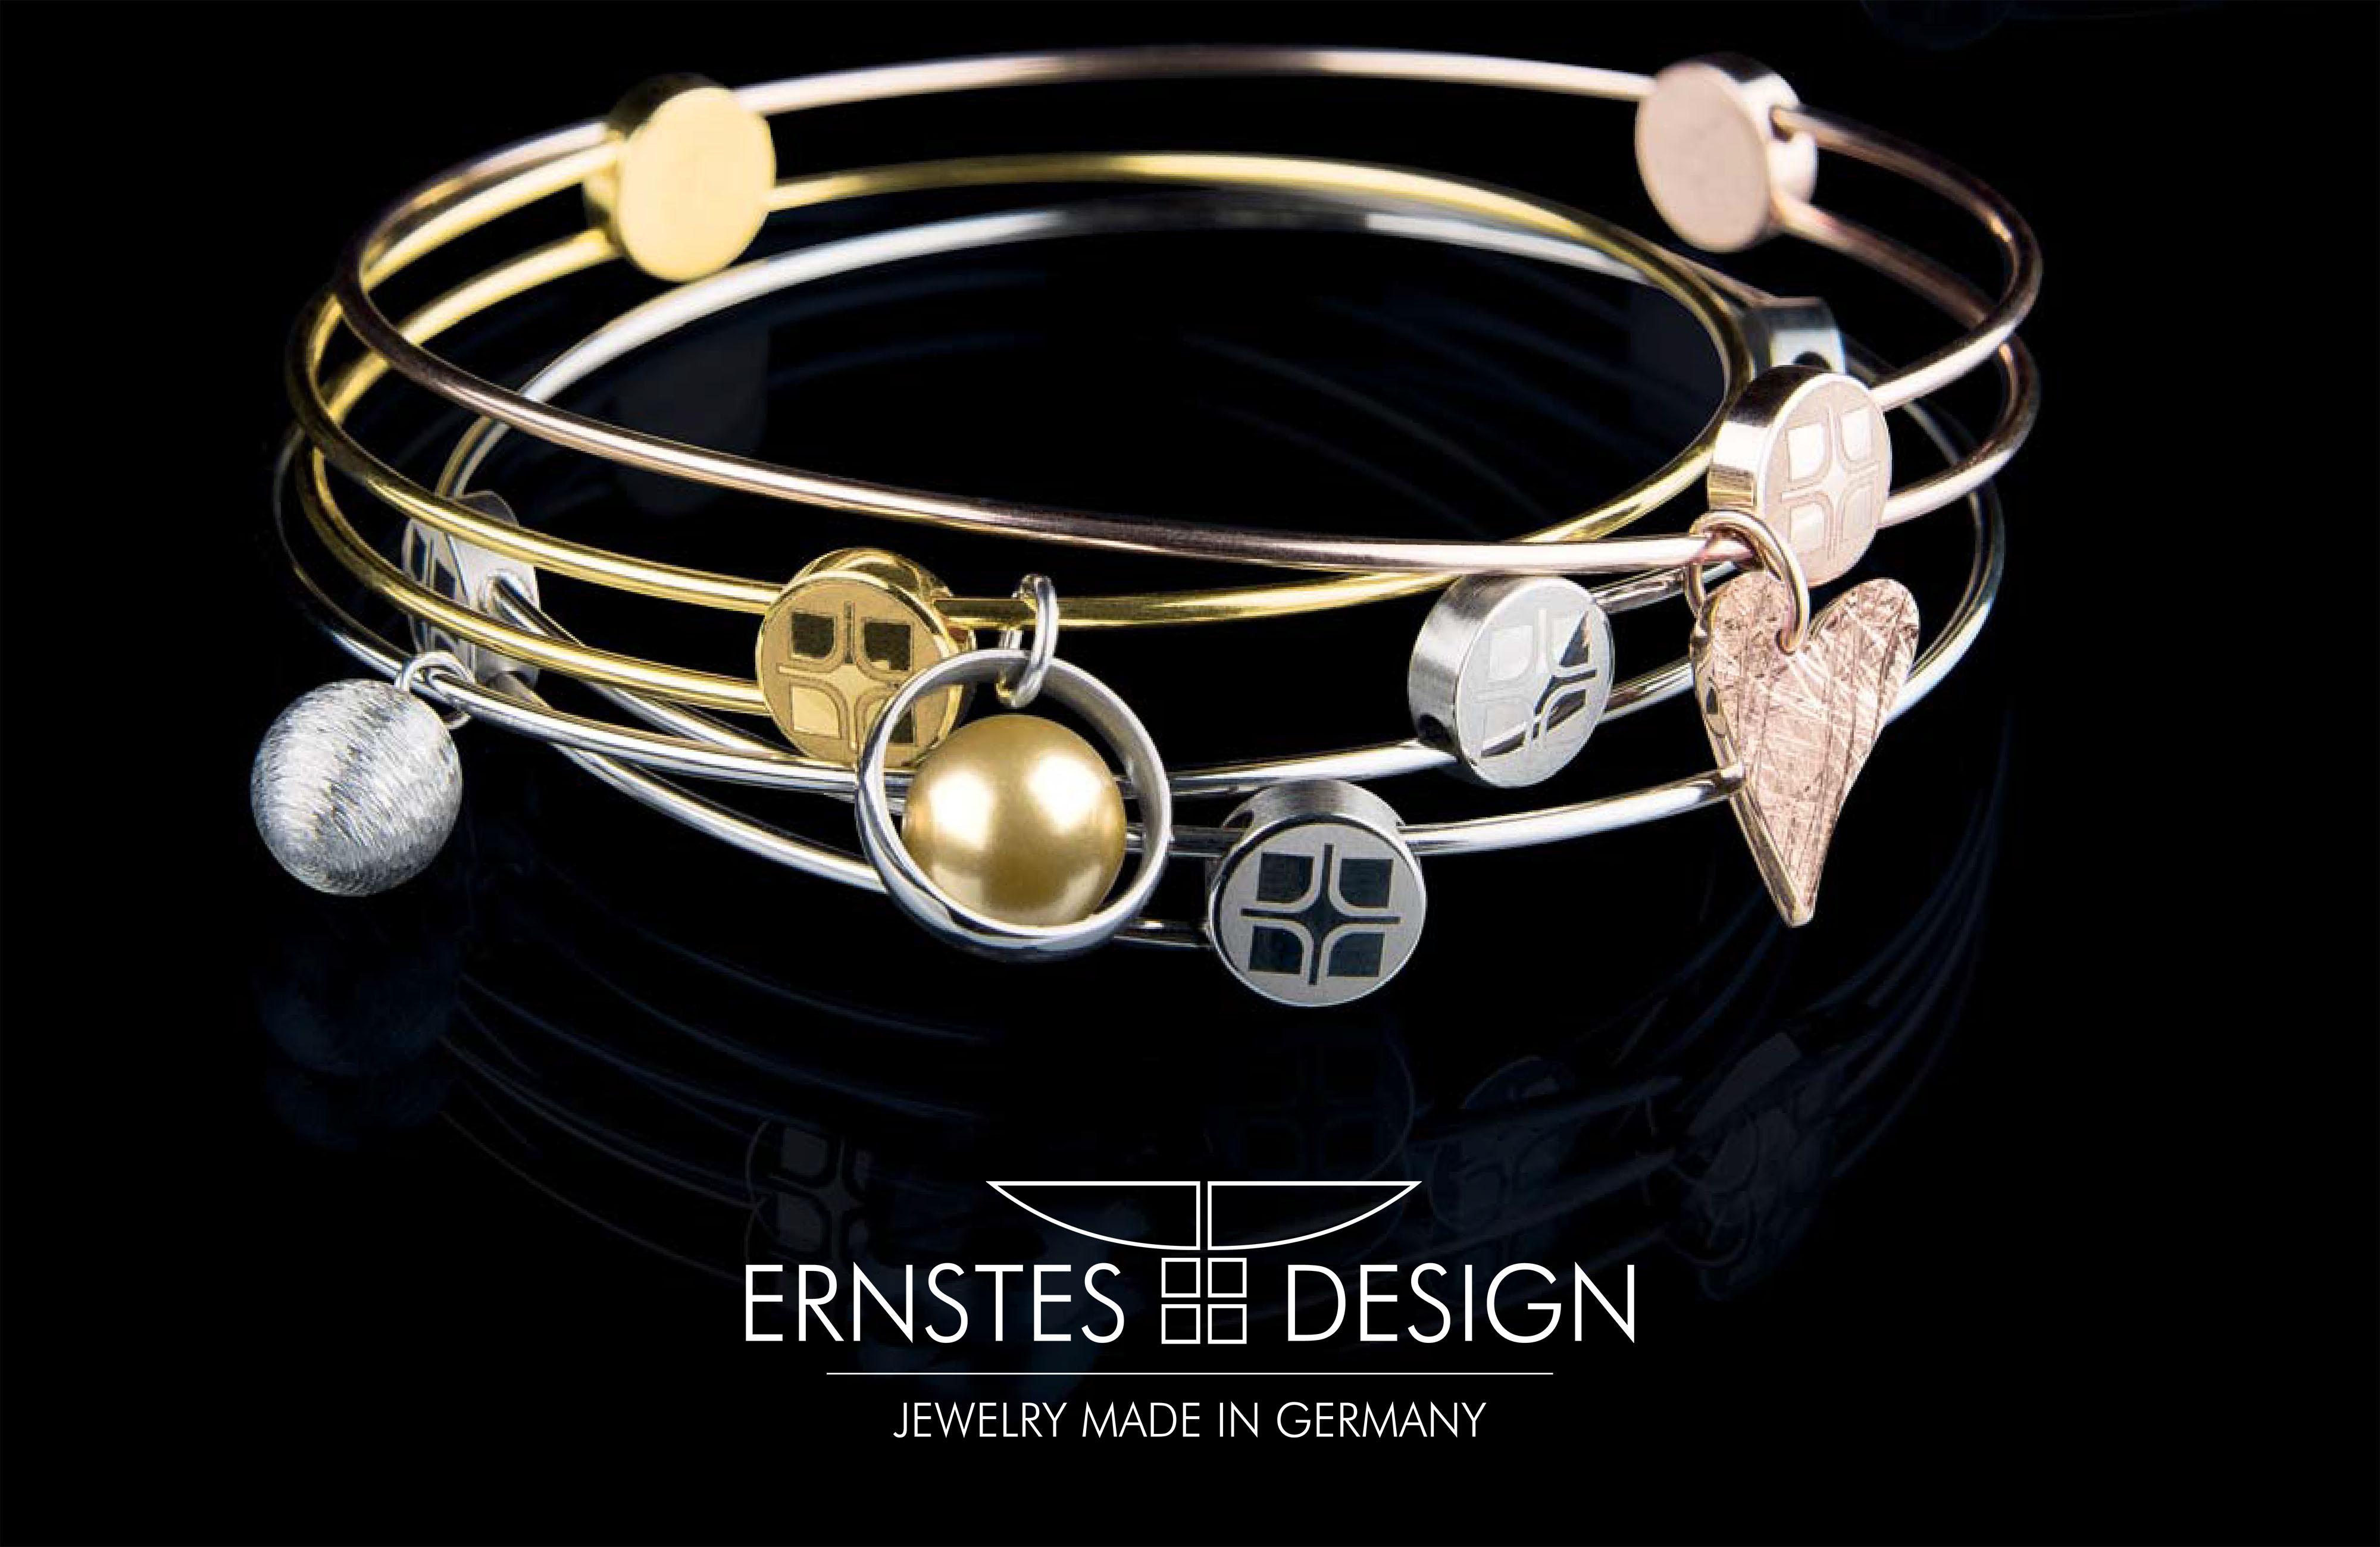 ernstes_design_ernstesdesign_Goldankauf_schmuck_modeschmuck_juwelier_juwelierareo_areo_solingen_ohligs_schmuckgeschäft_diamanten